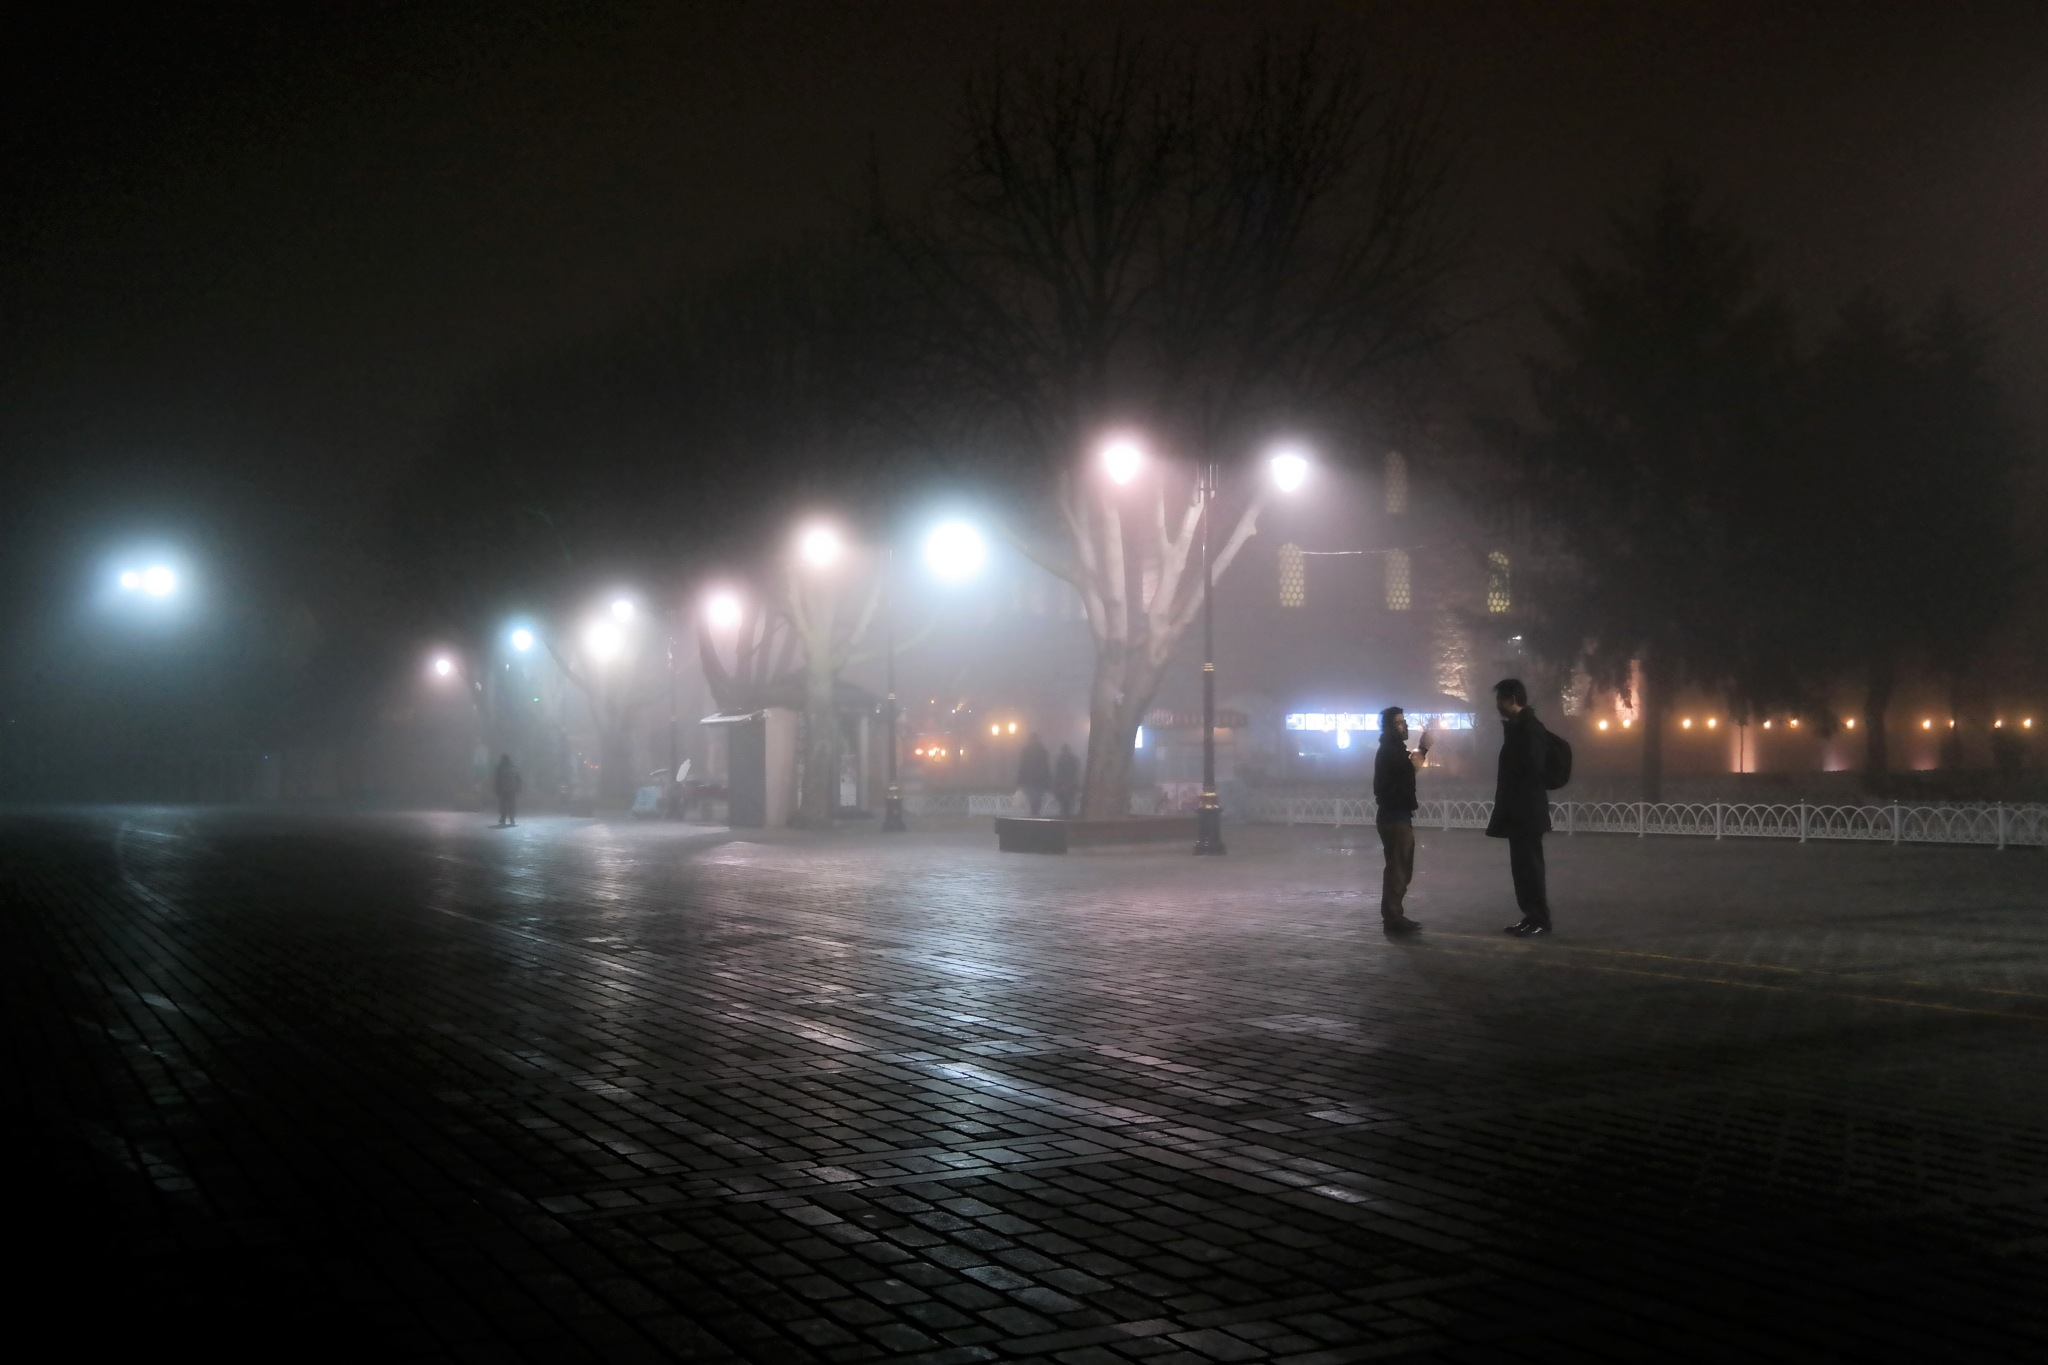 late evening fog by Muhsin Özcan